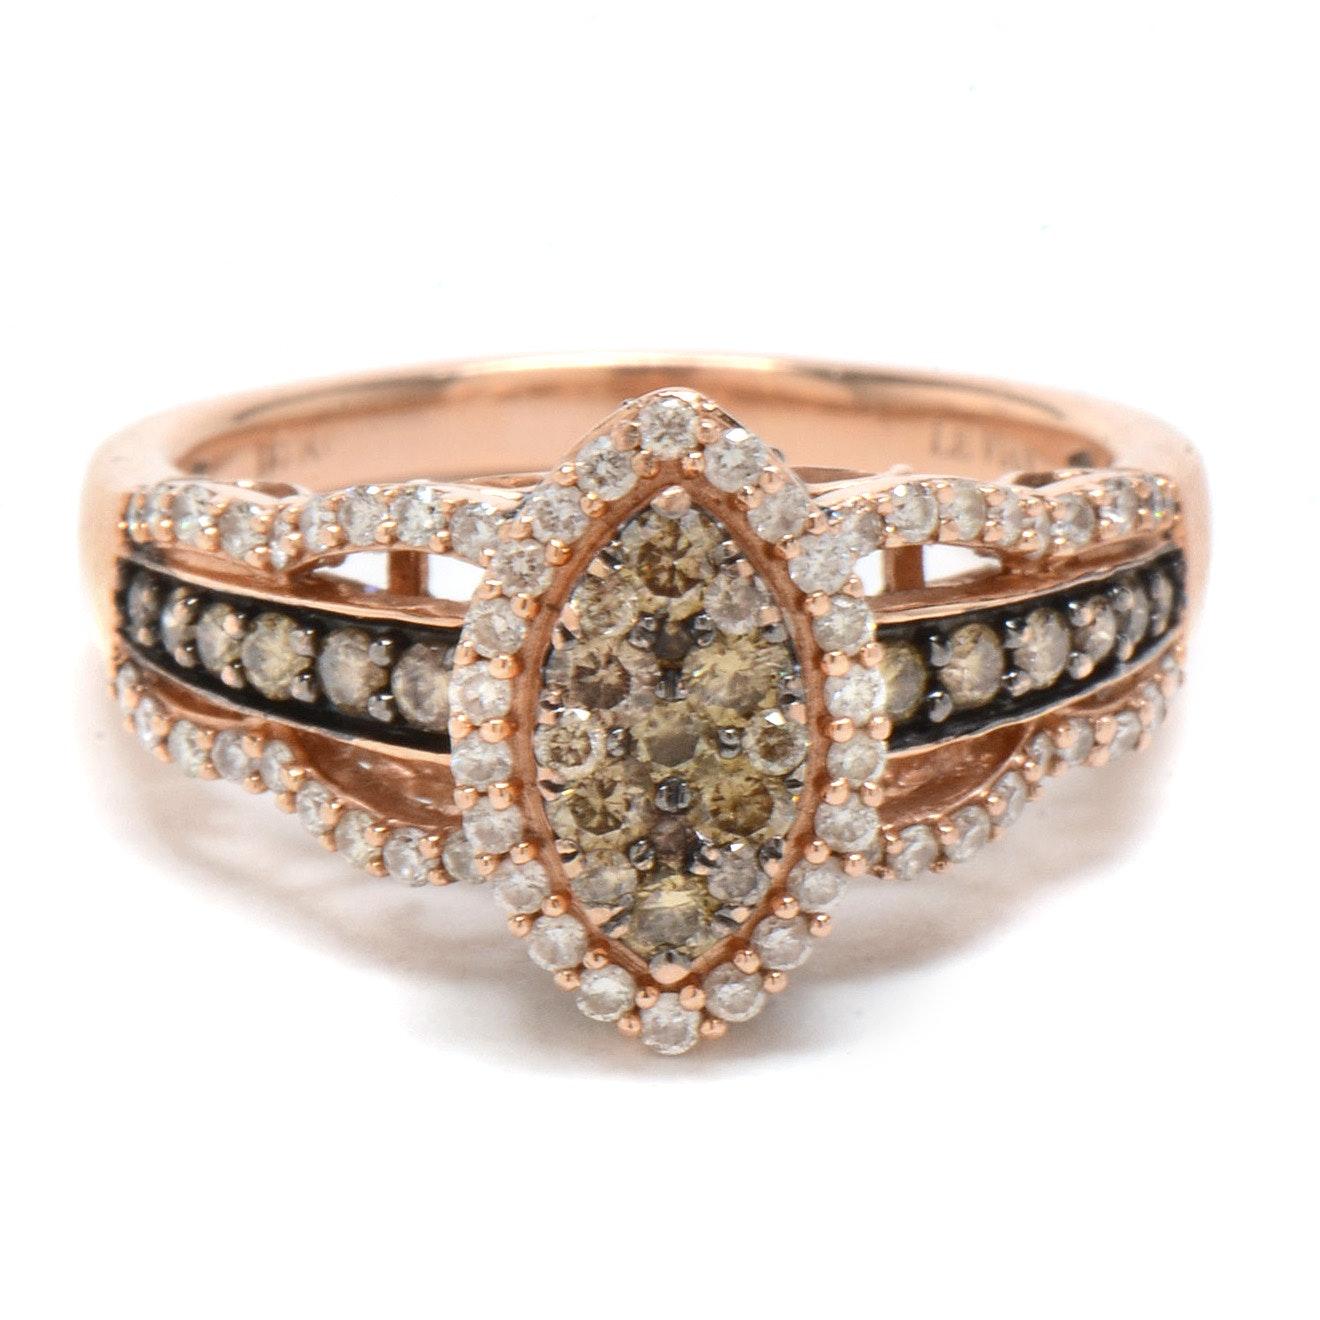 Le Vian 14K Rose Gold Chocolate Diamond Ring